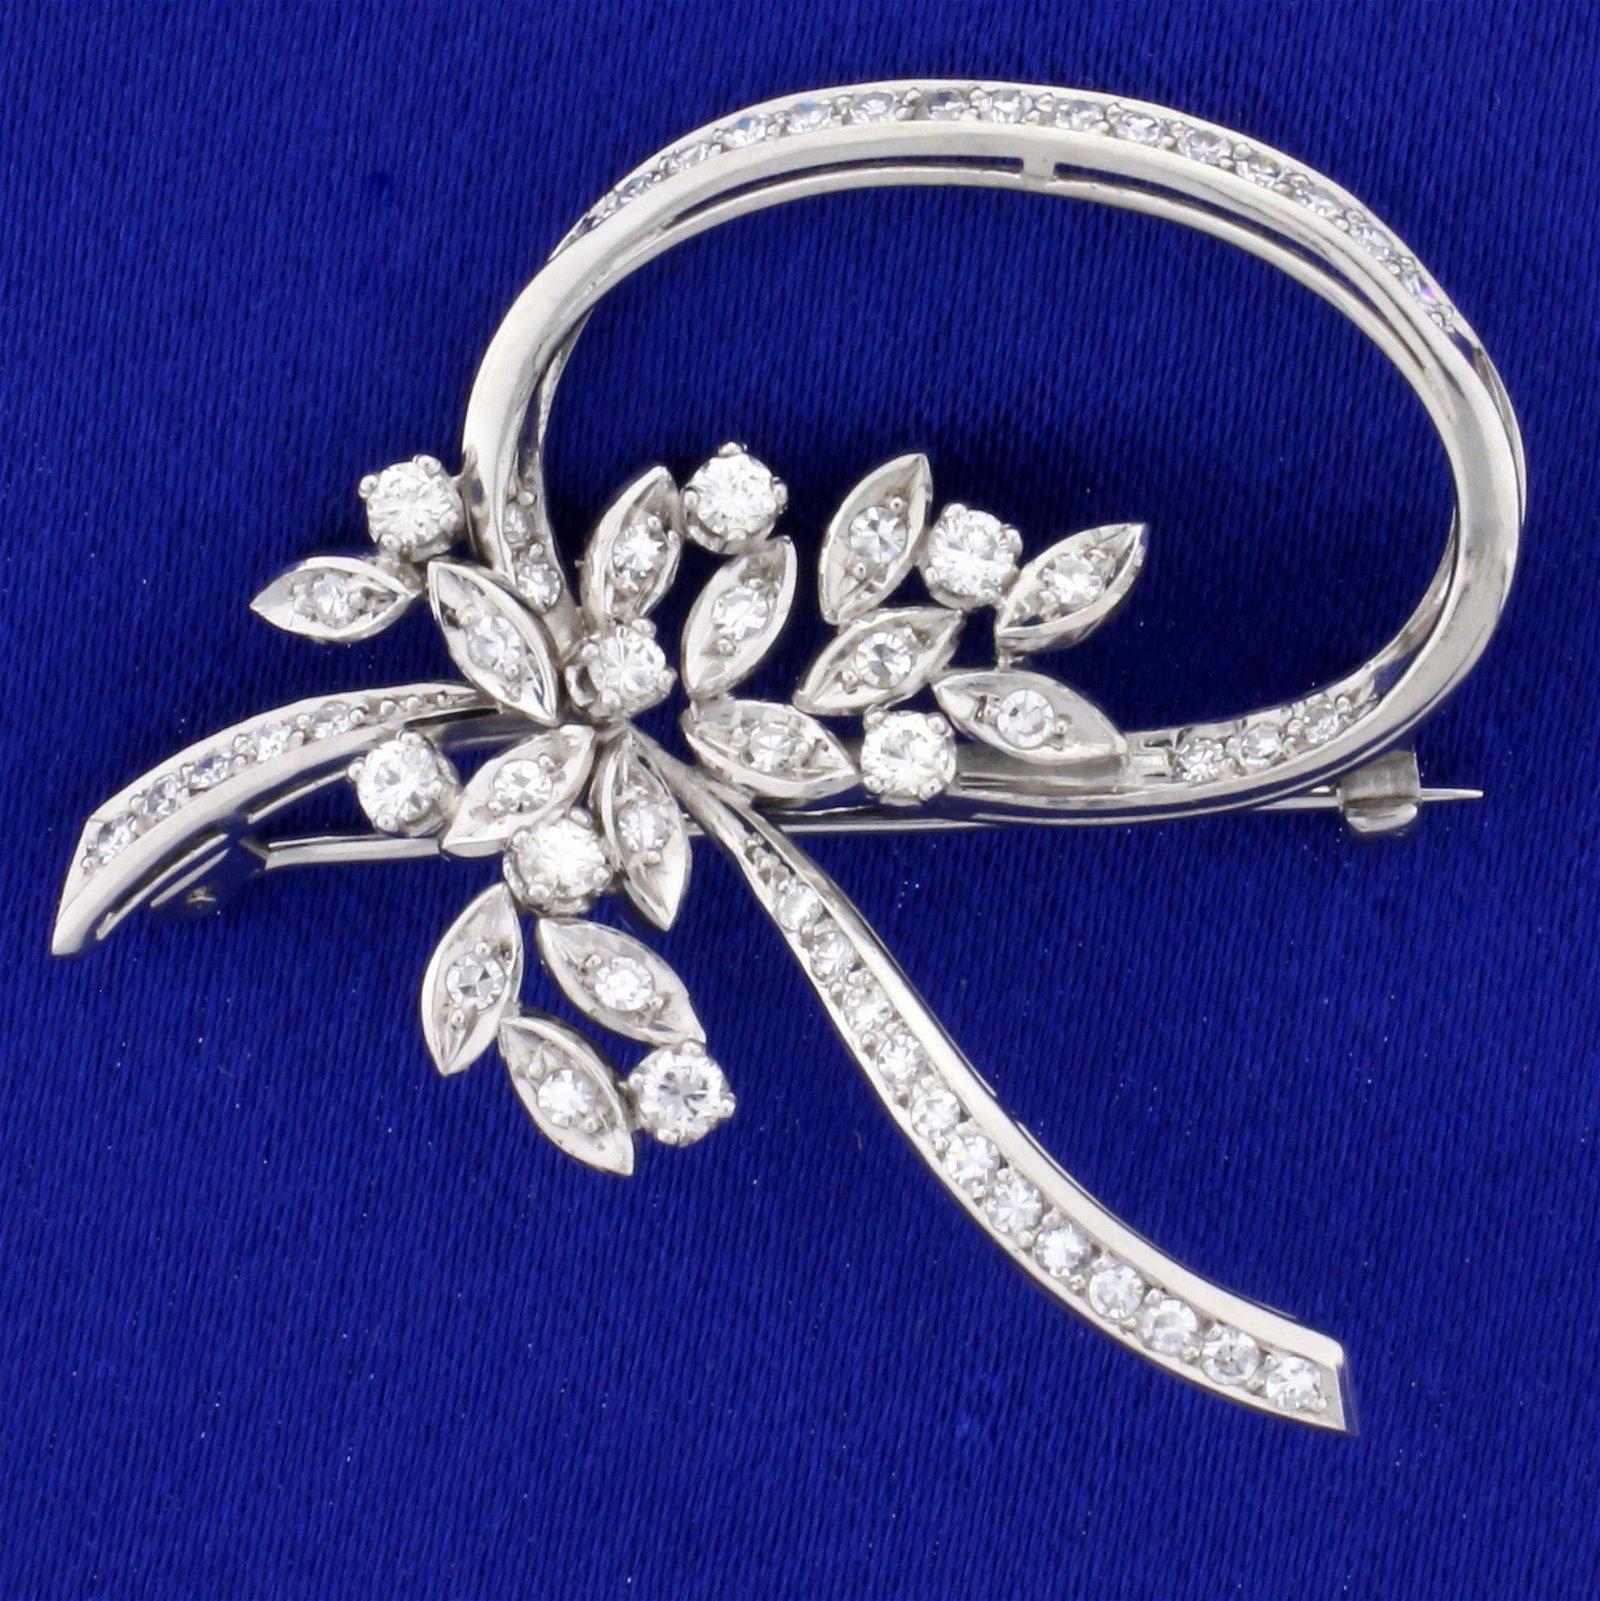 Vintage 1ct TW Diamond Ribbon Flower Design Pin in 18K